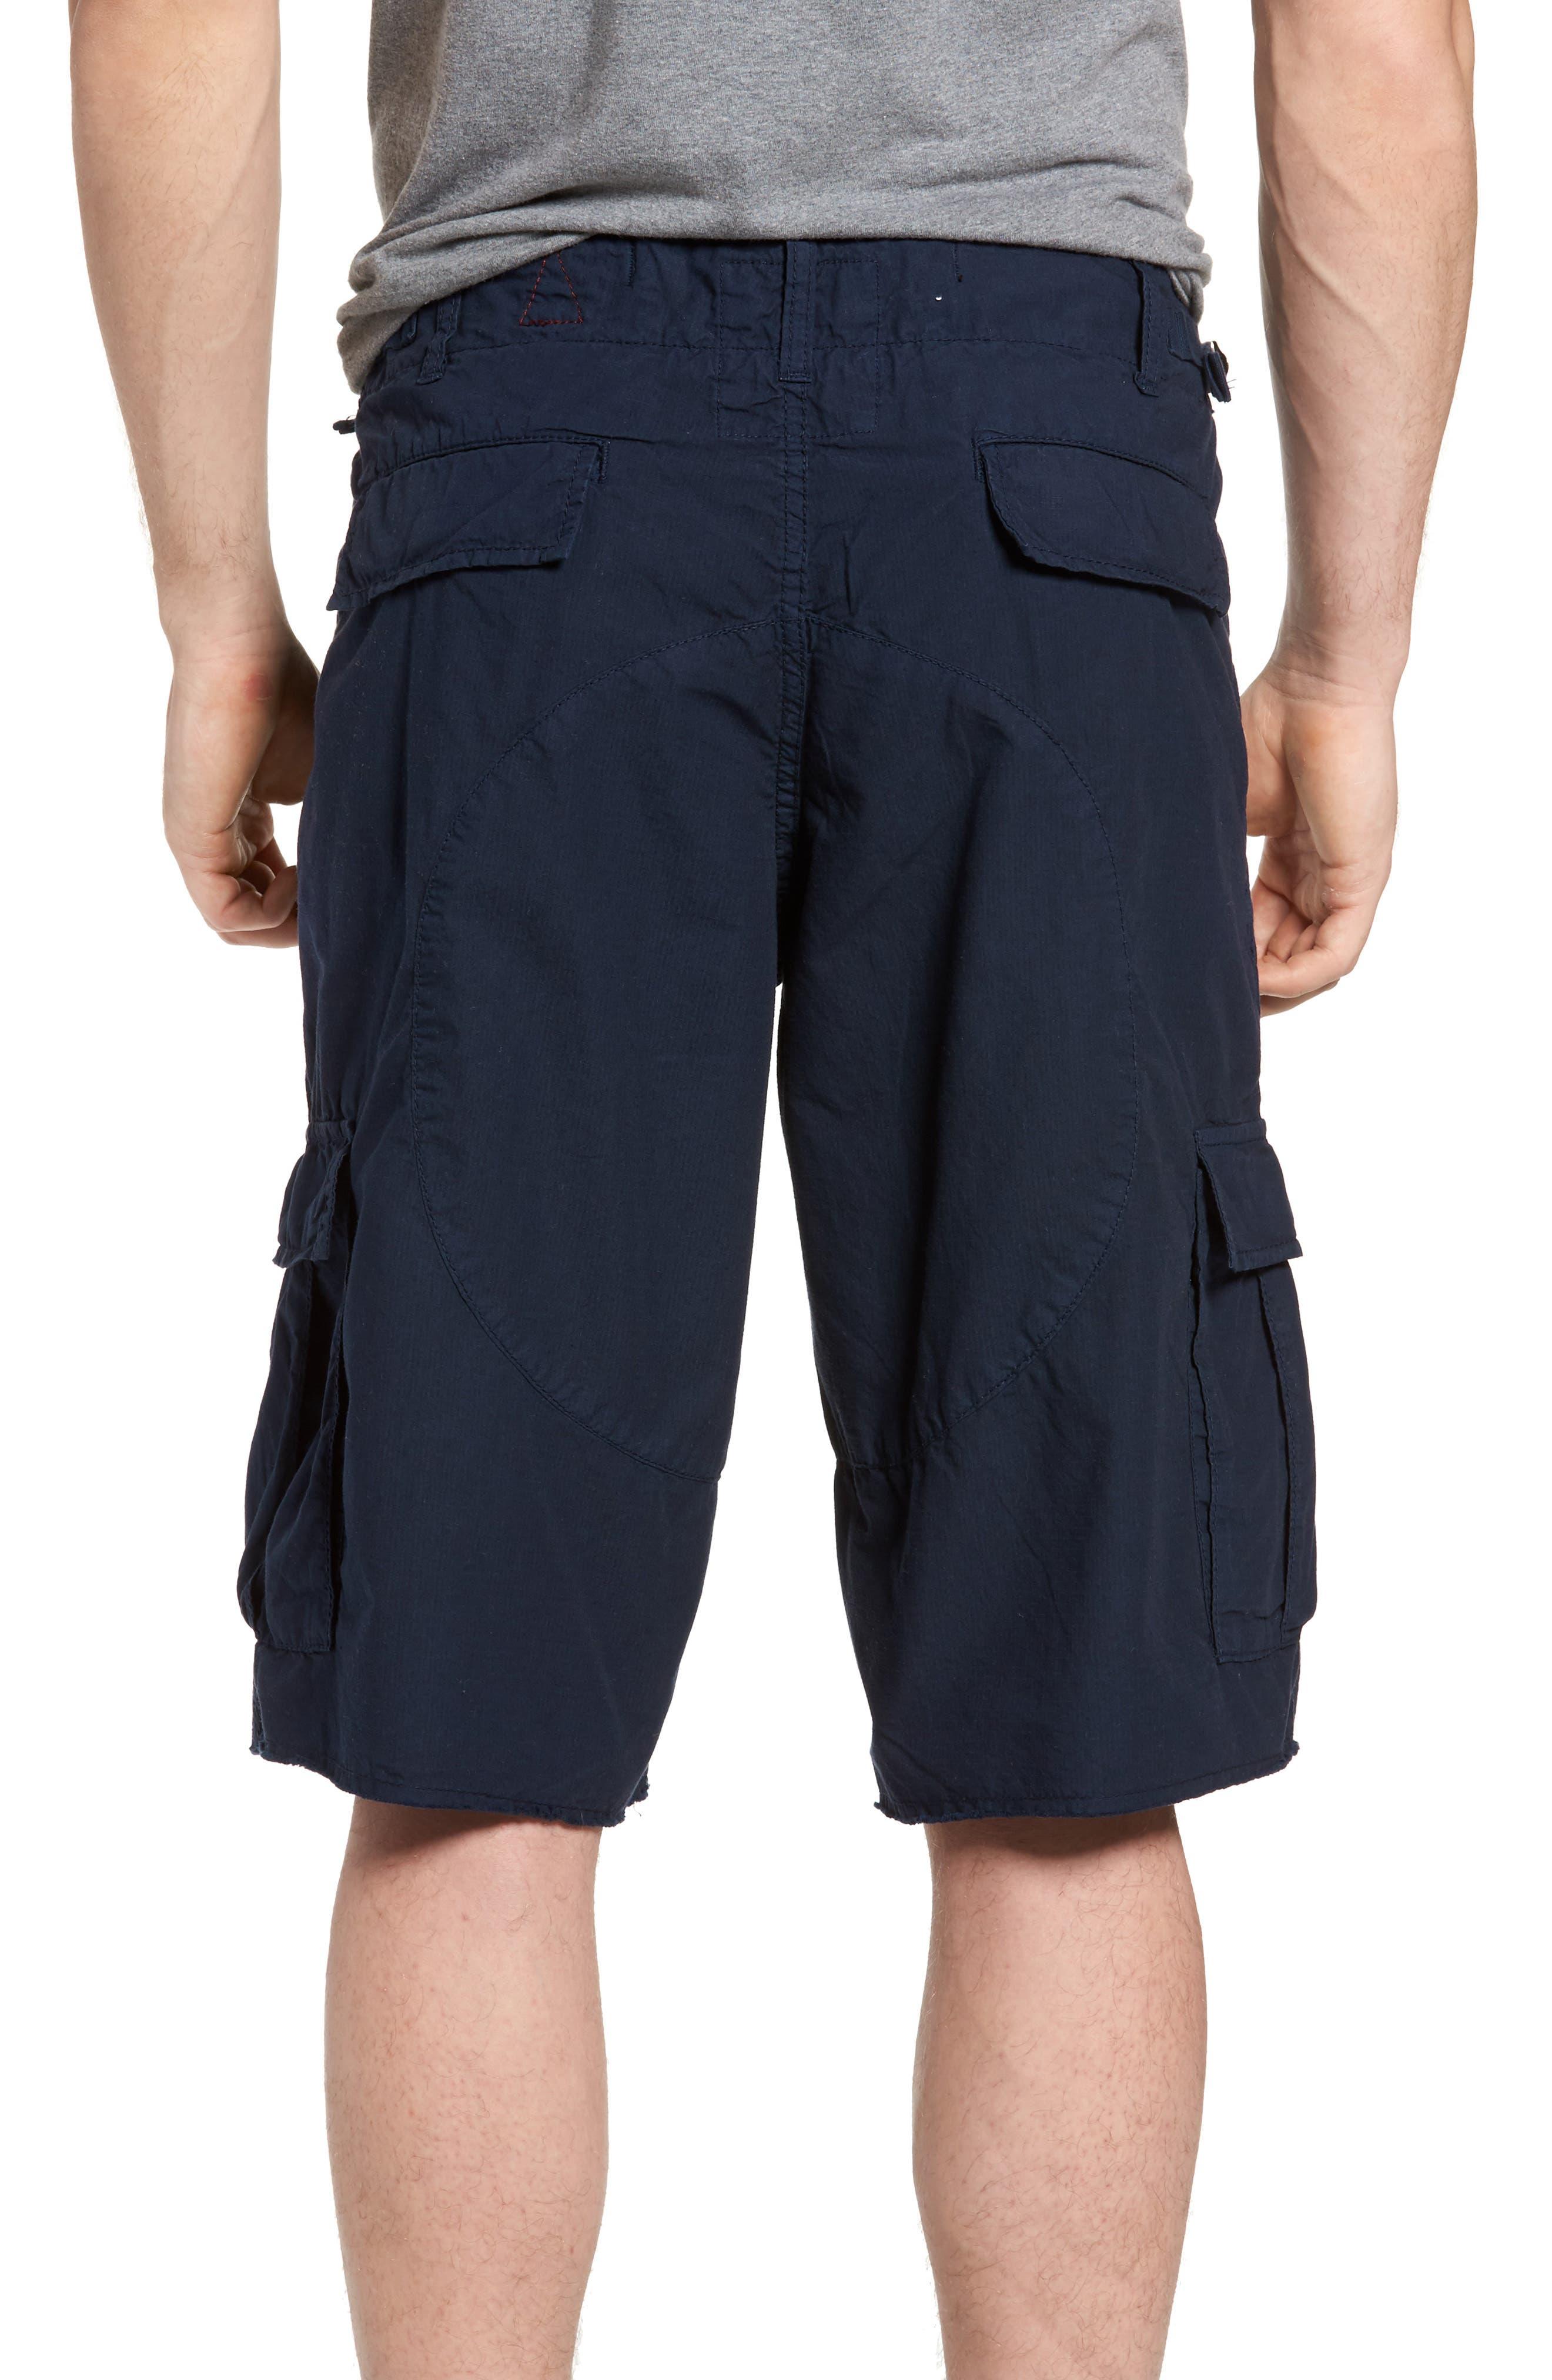 'Oxnard' Cargo Shorts,                             Alternate thumbnail 2, color,                             Navy